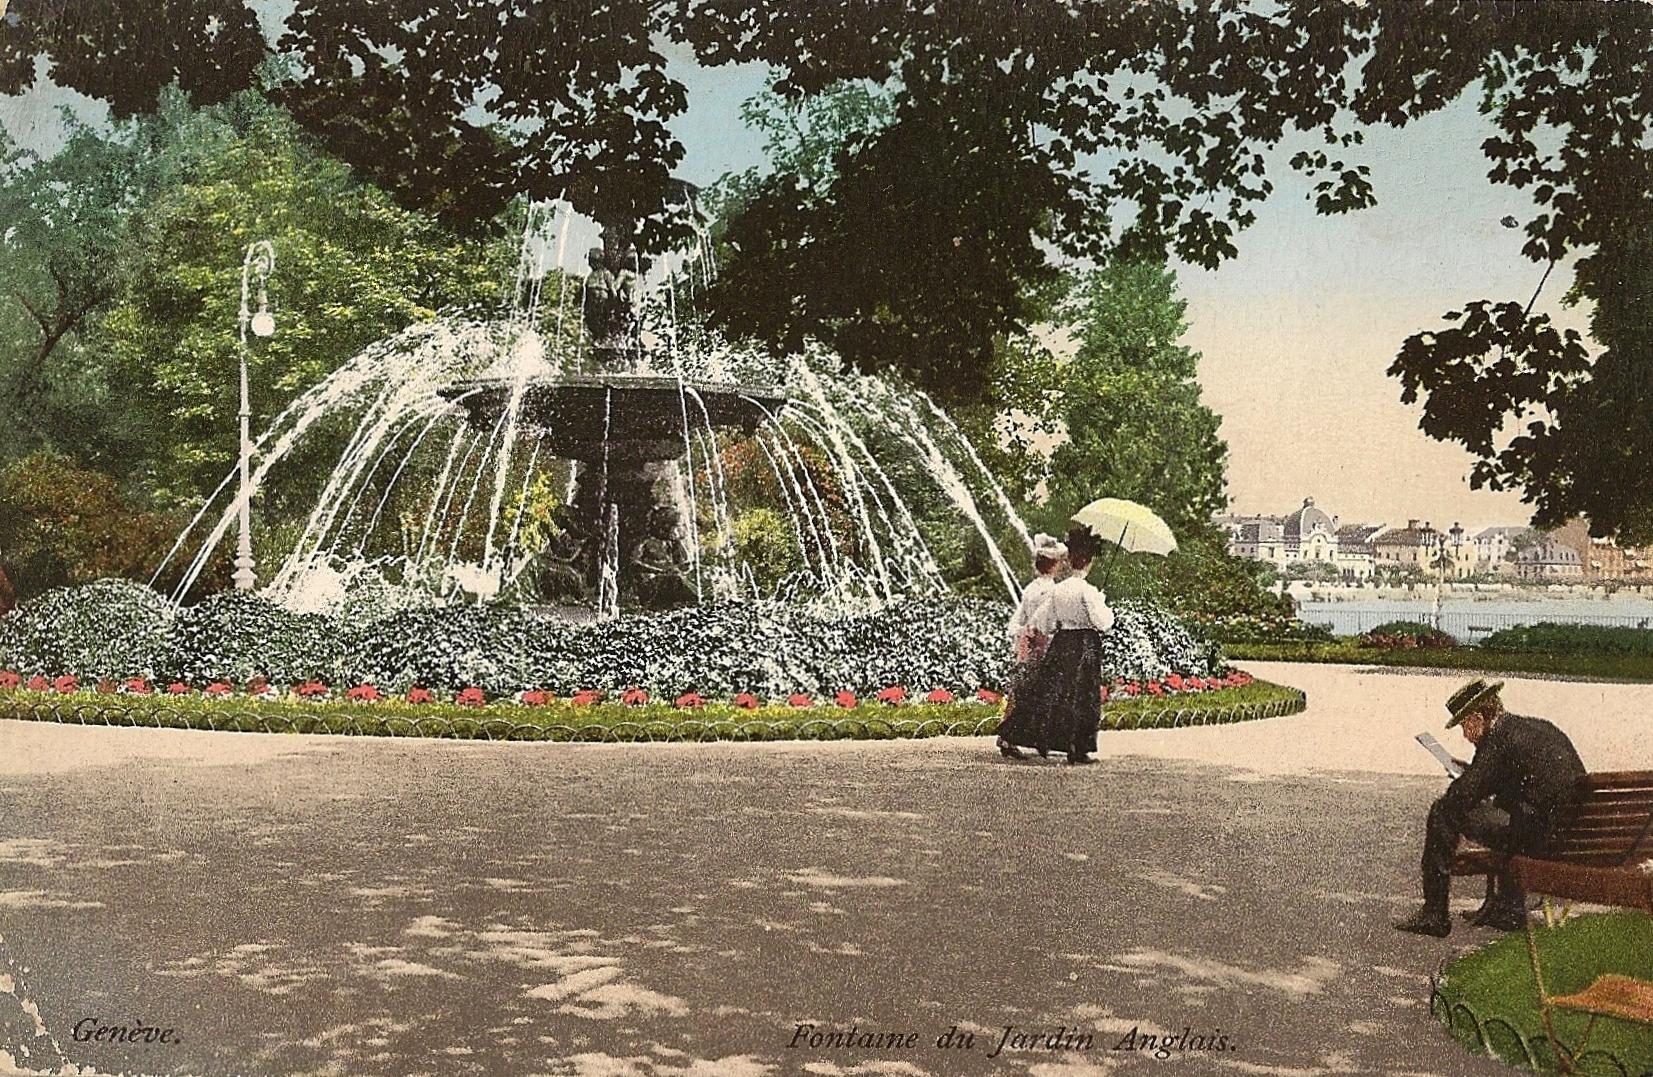 Fontaine des quatre saisons jardin anglais notre histoire for Jardin anglais histoire